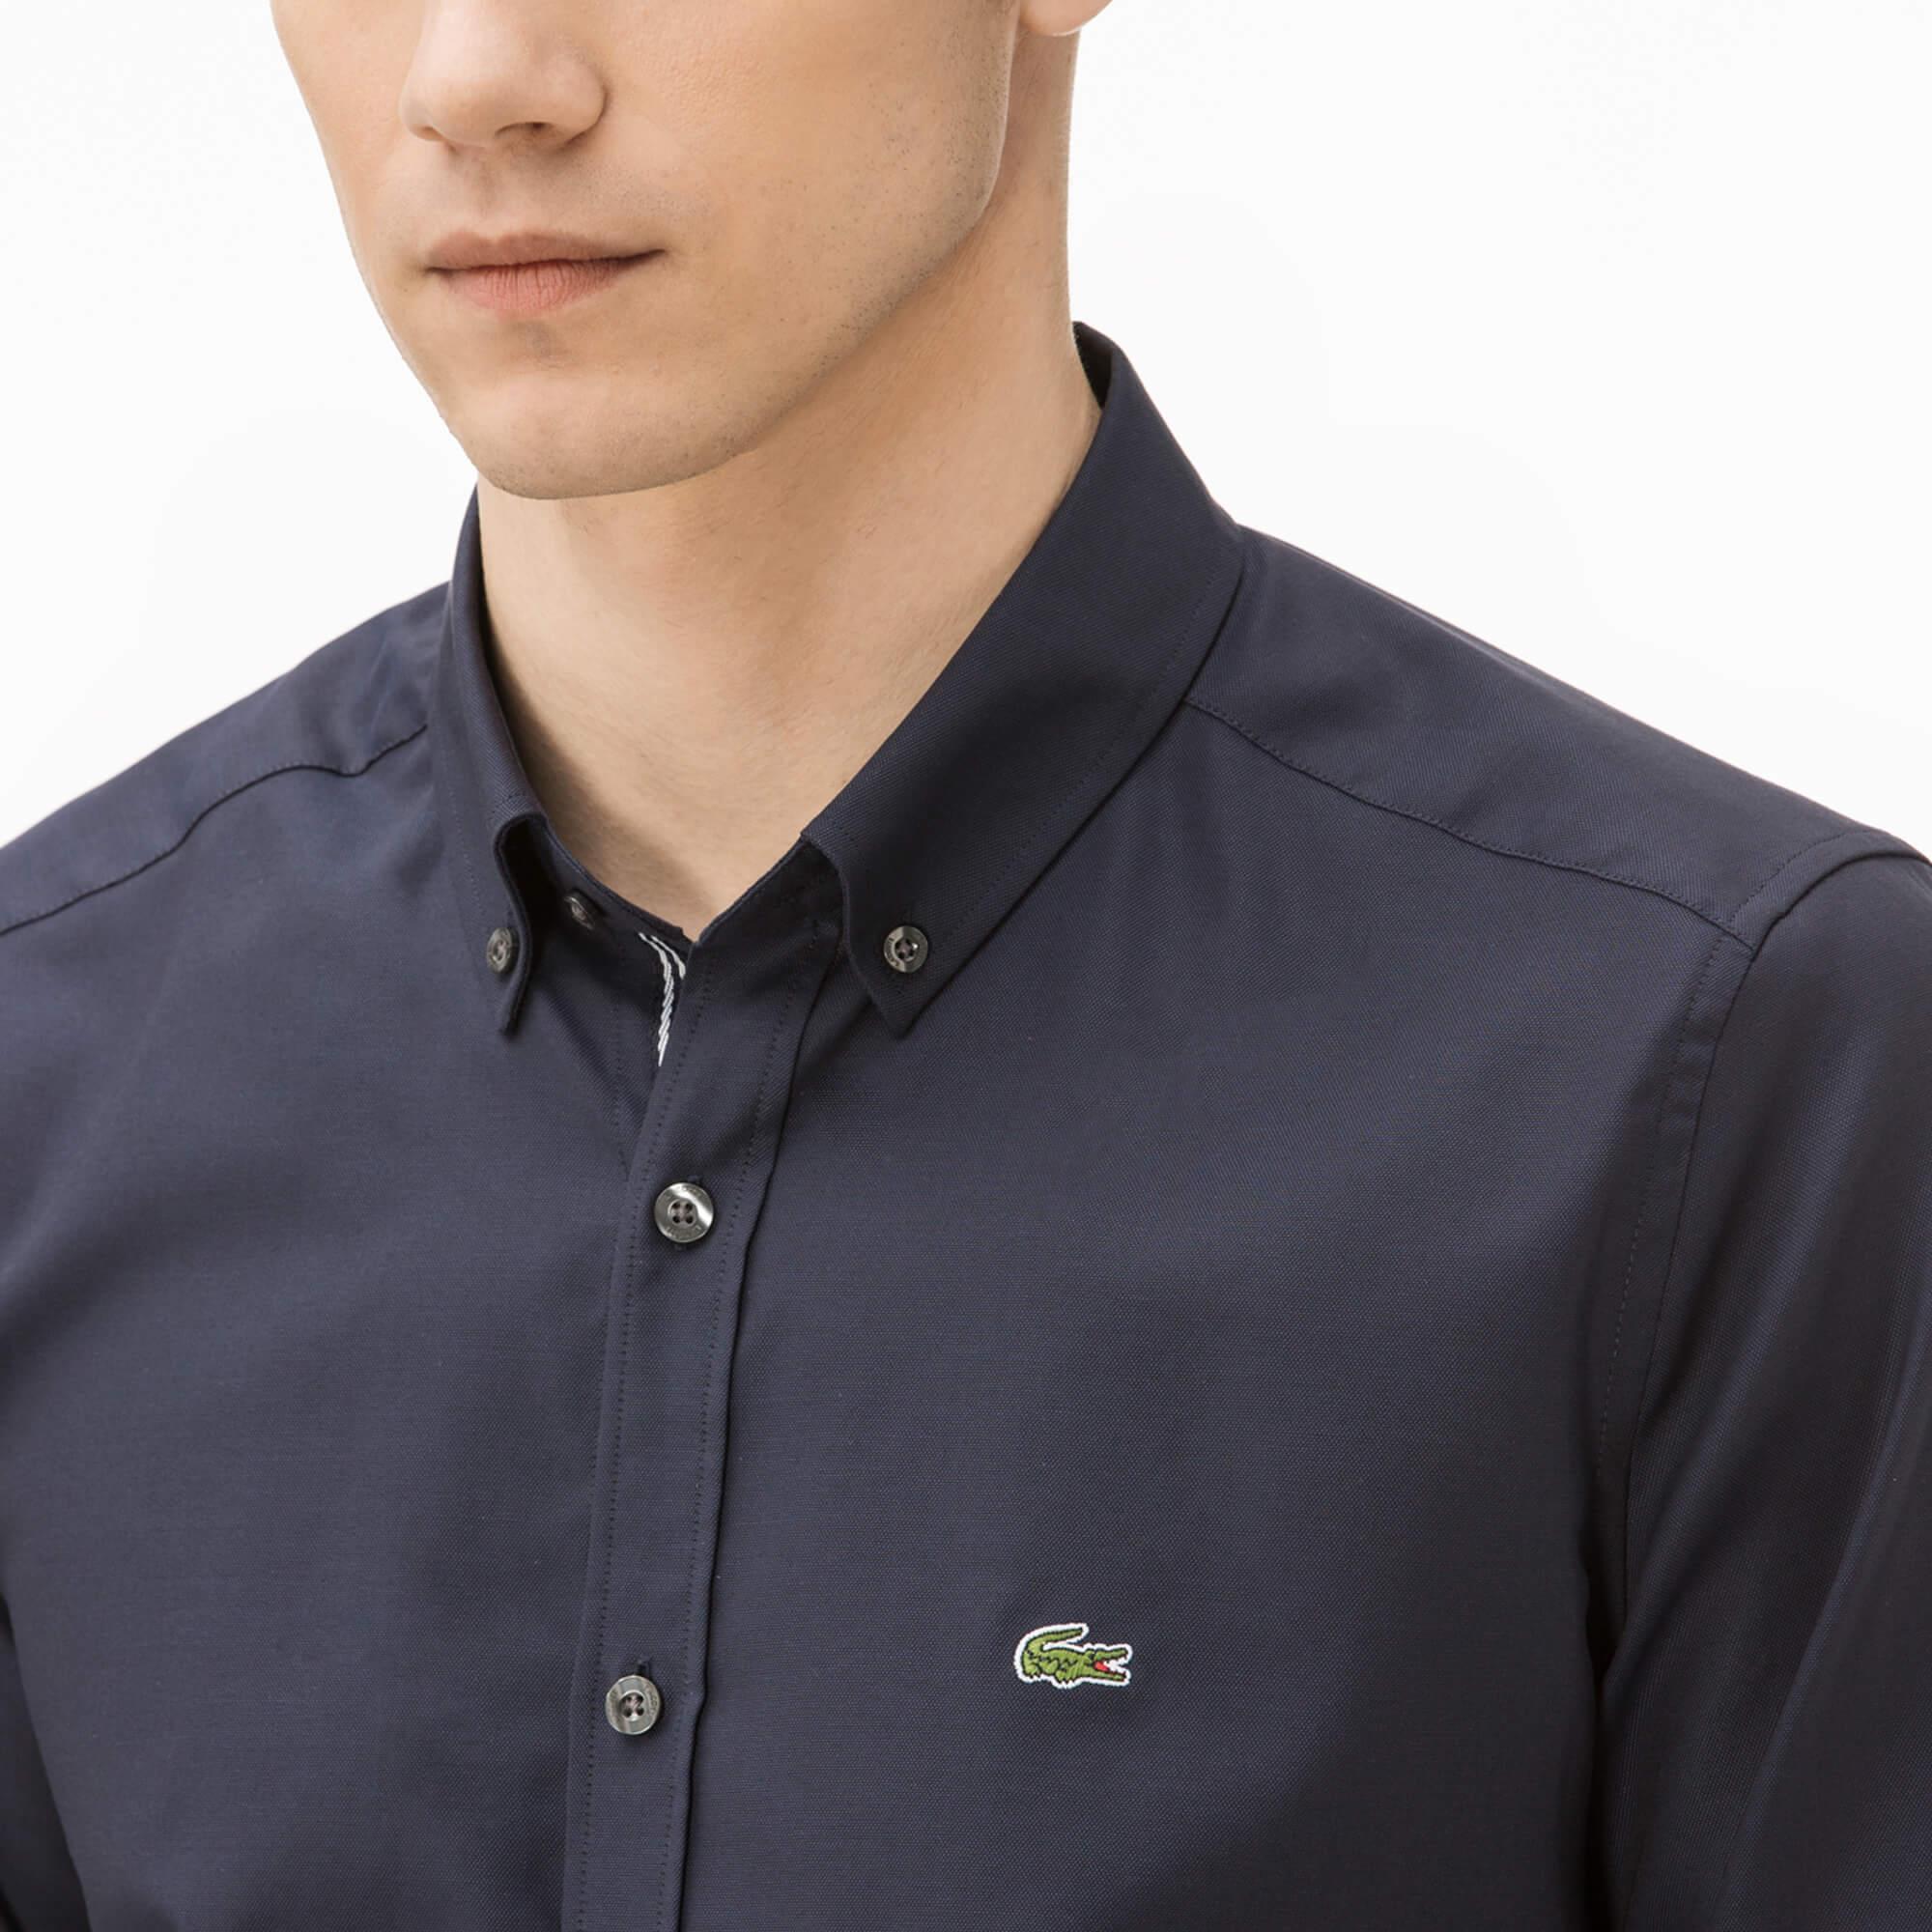 Lacoste Erkek Slim Fit Lacivert Oxford Gömlek